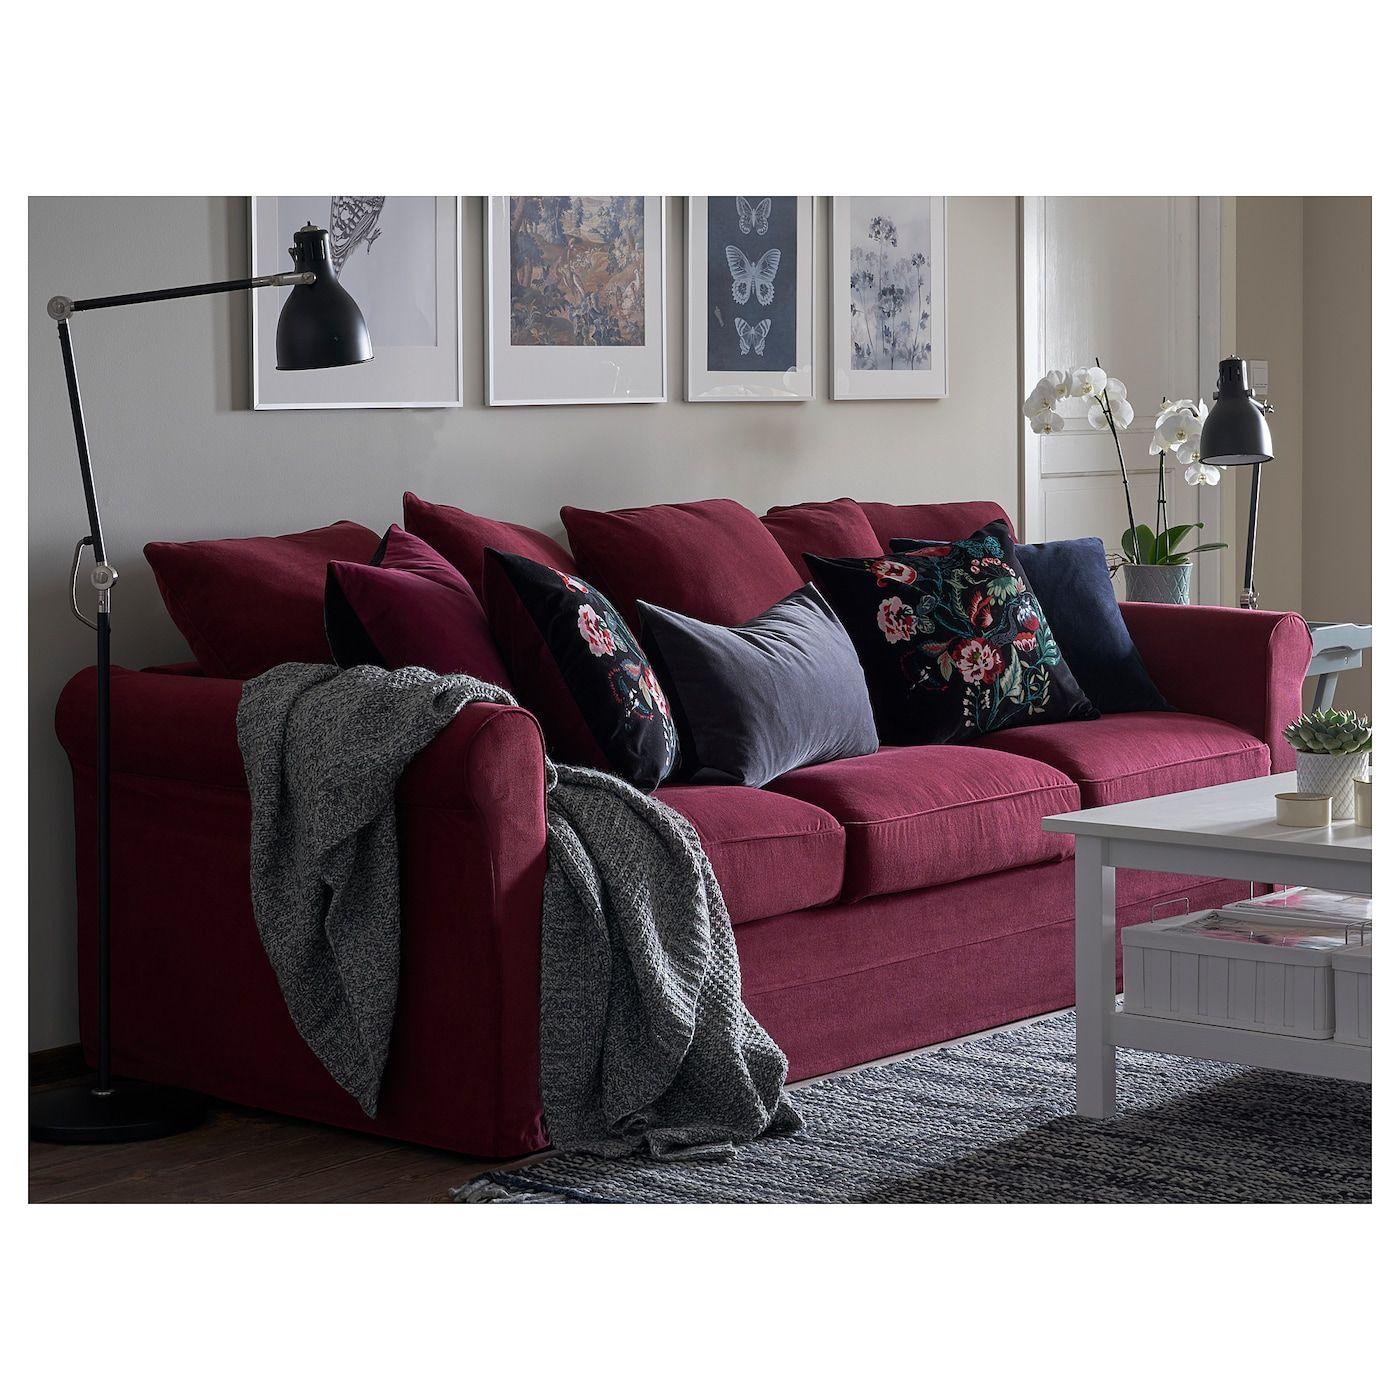 Ikea Gronlid Sofa Ljungen Dark Red Red Sofa Living Room Burgundy Living Room Red Couch Living Room